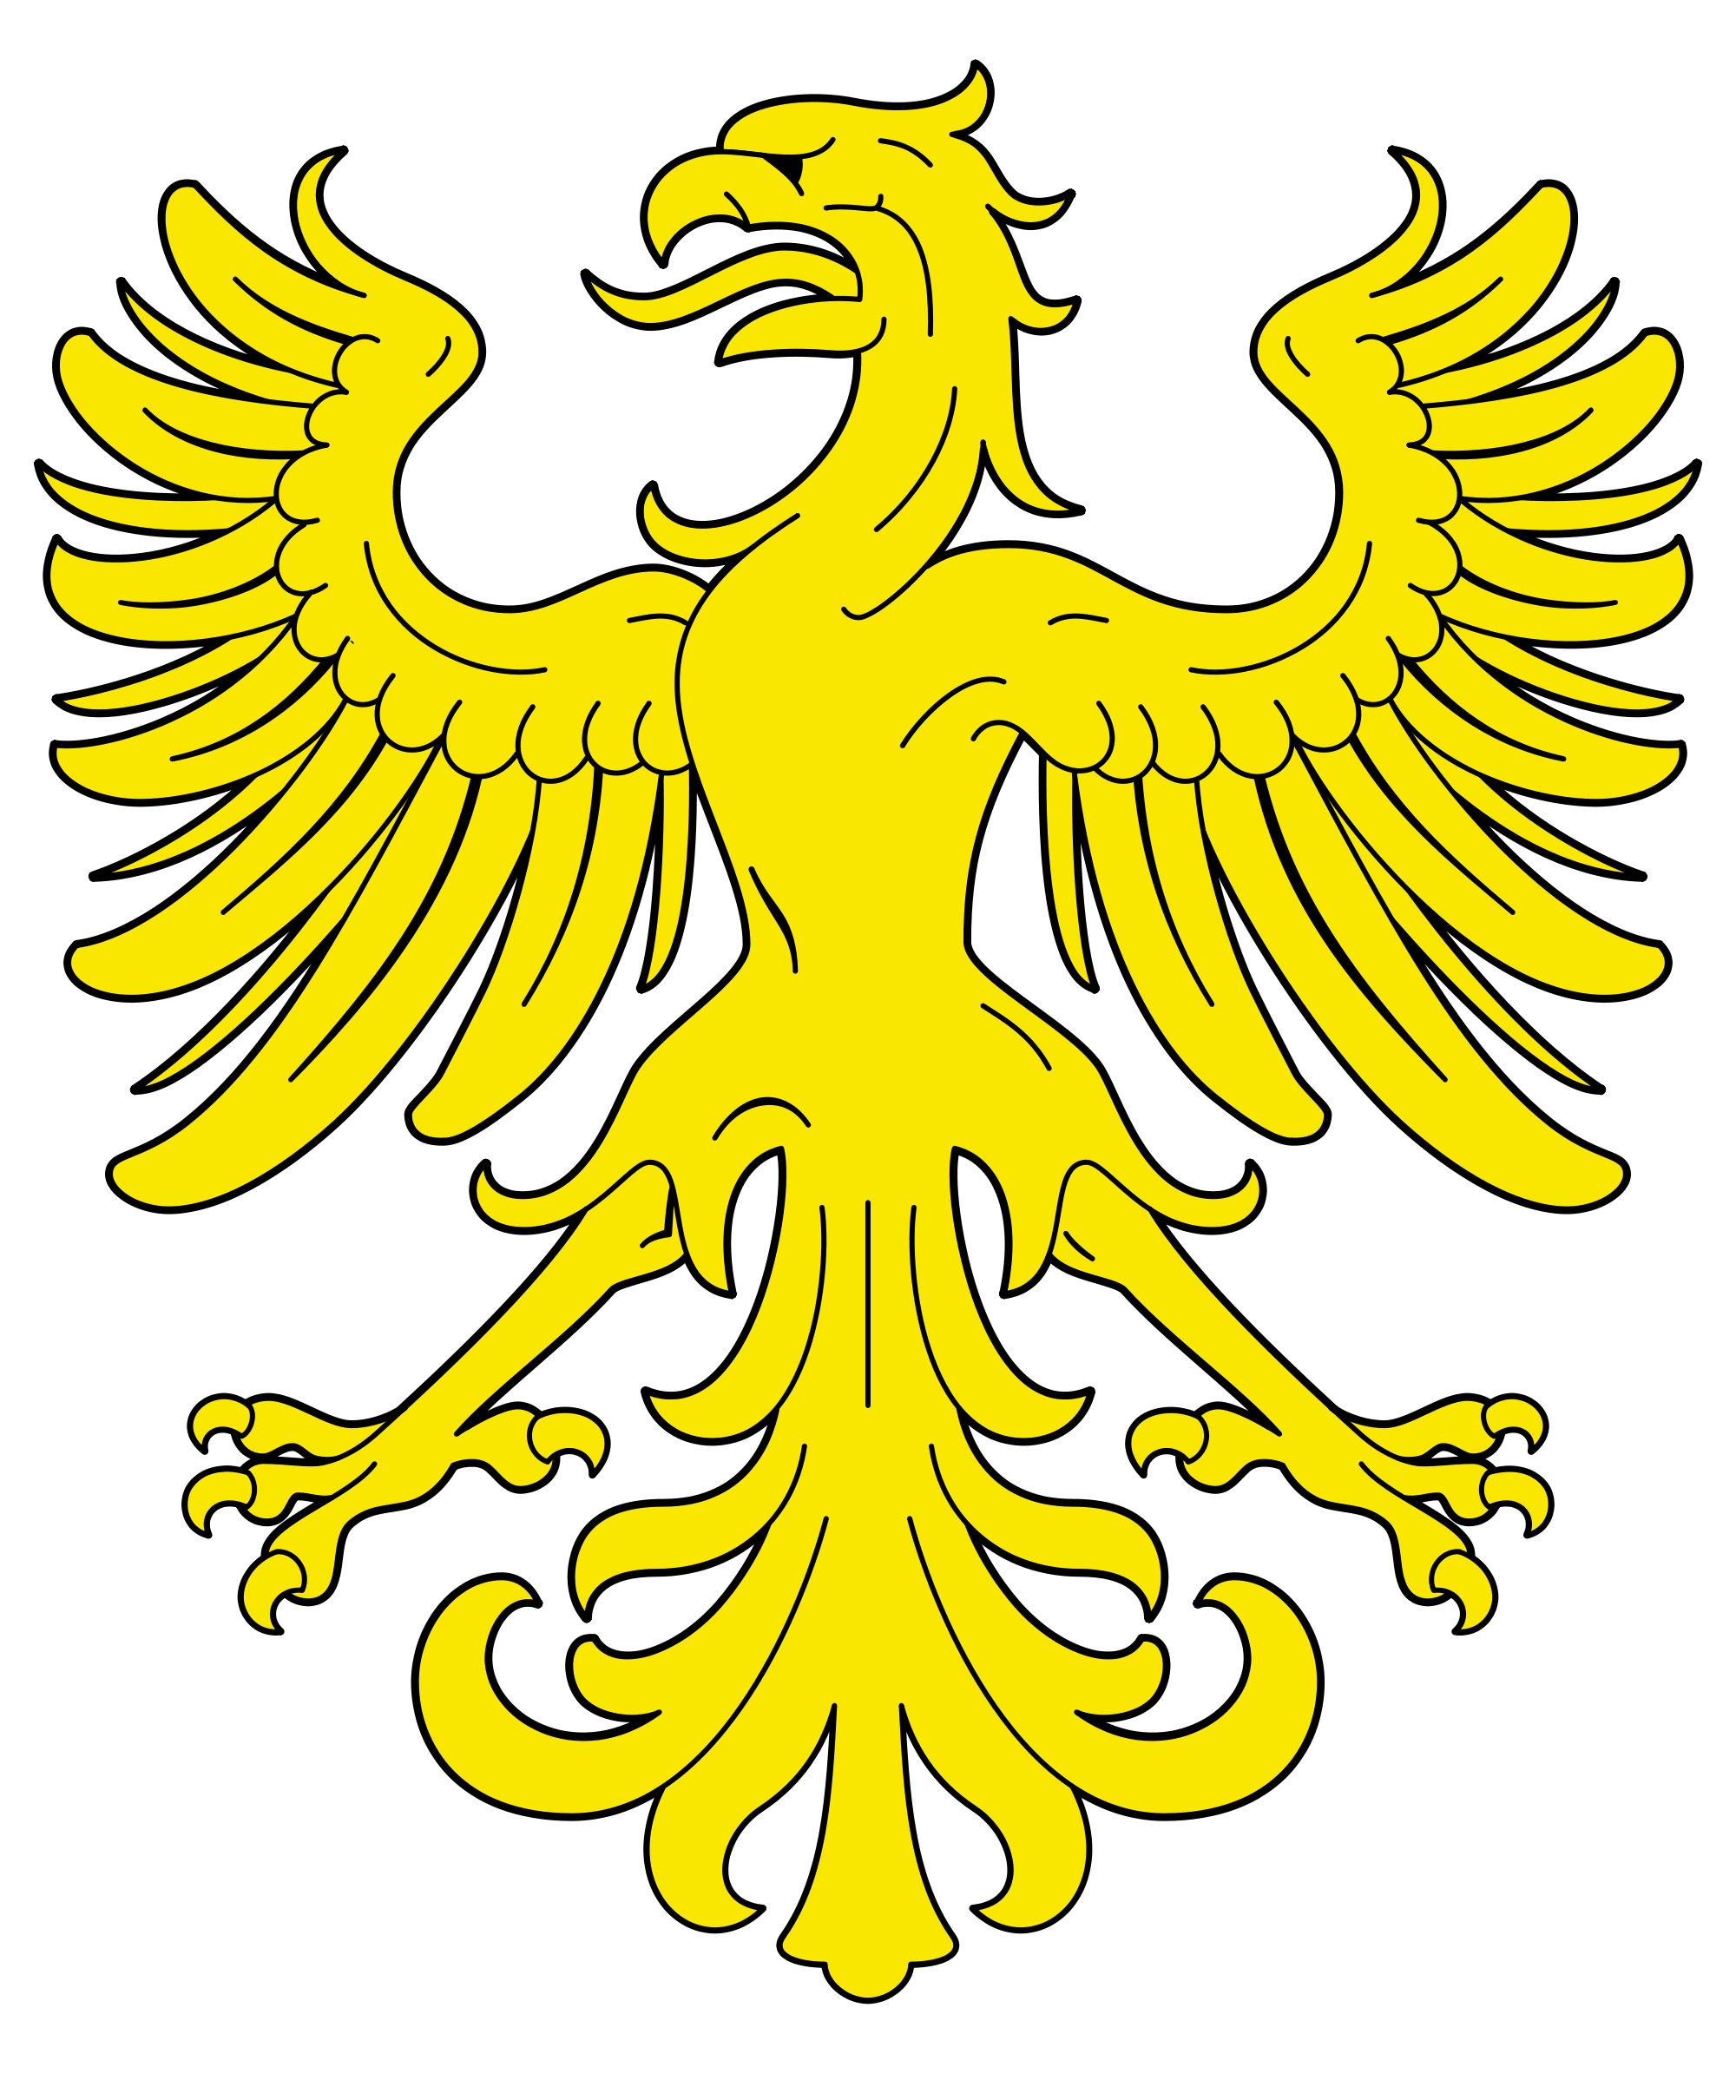 Attitude (heraldry) Heraldry, Heraldry design, Coat of arms